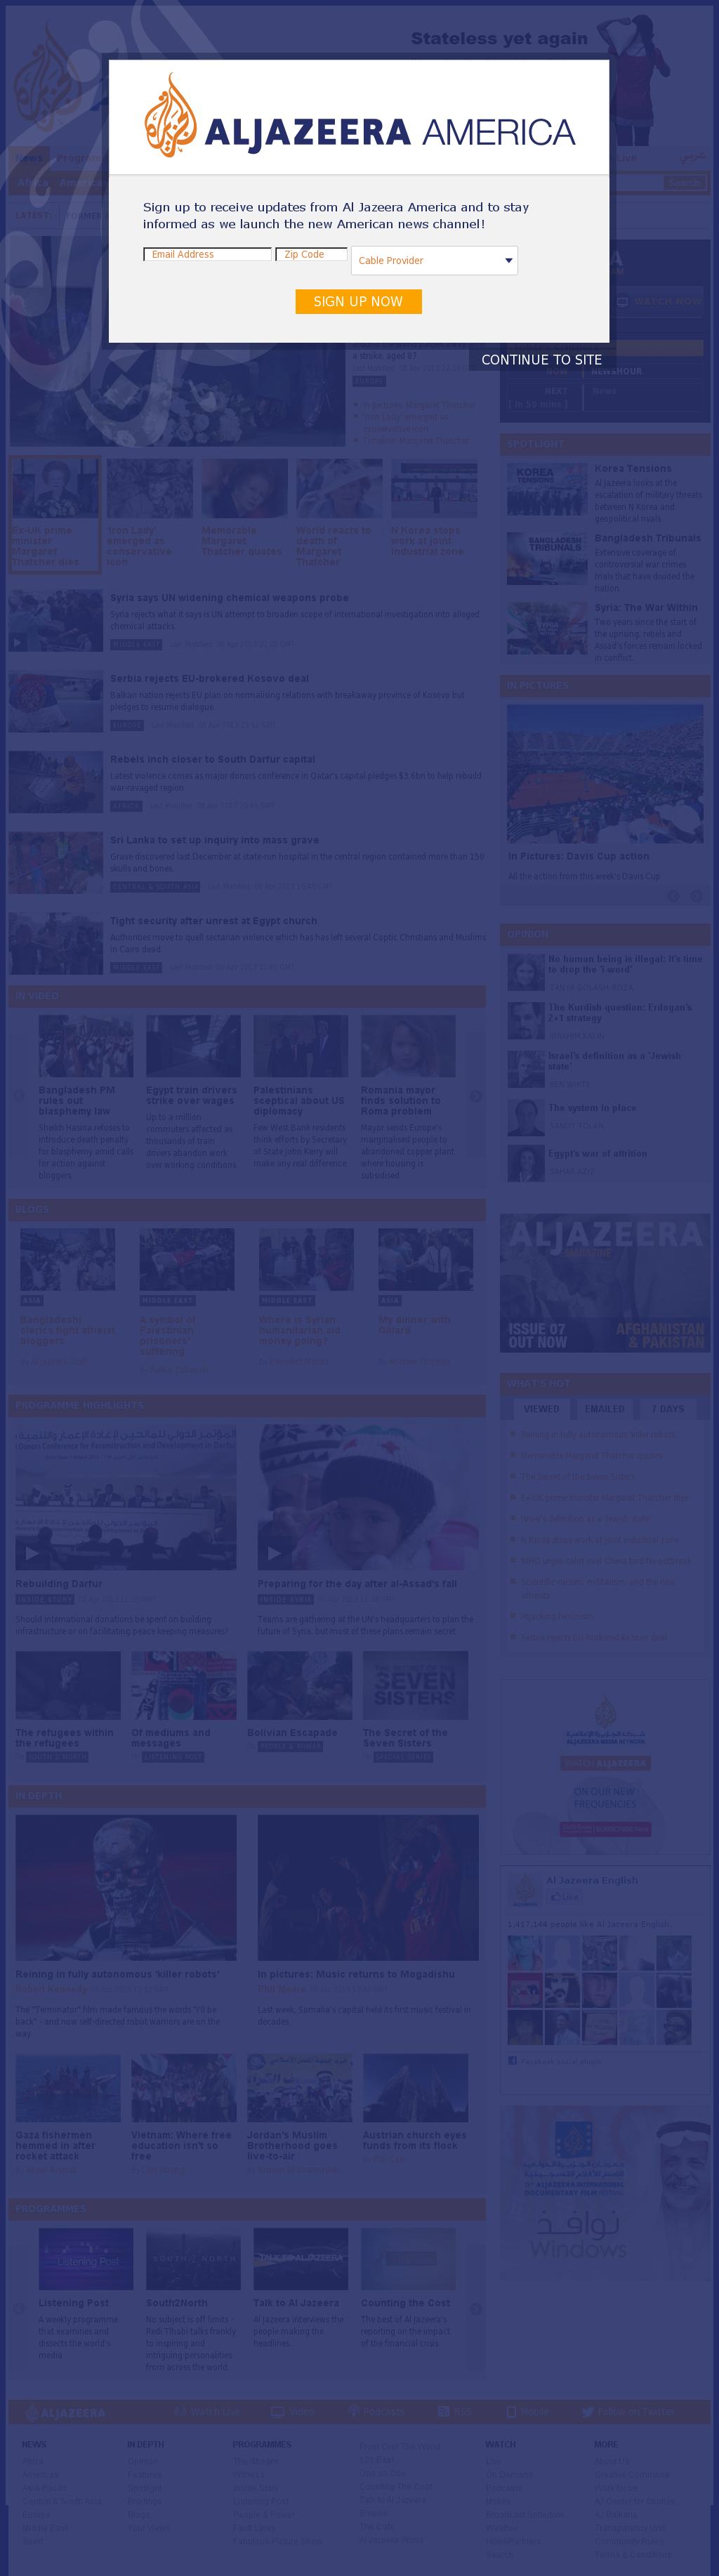 Al Jazeera (English) at Tuesday April 9, 2013, 2:11 a.m. UTC